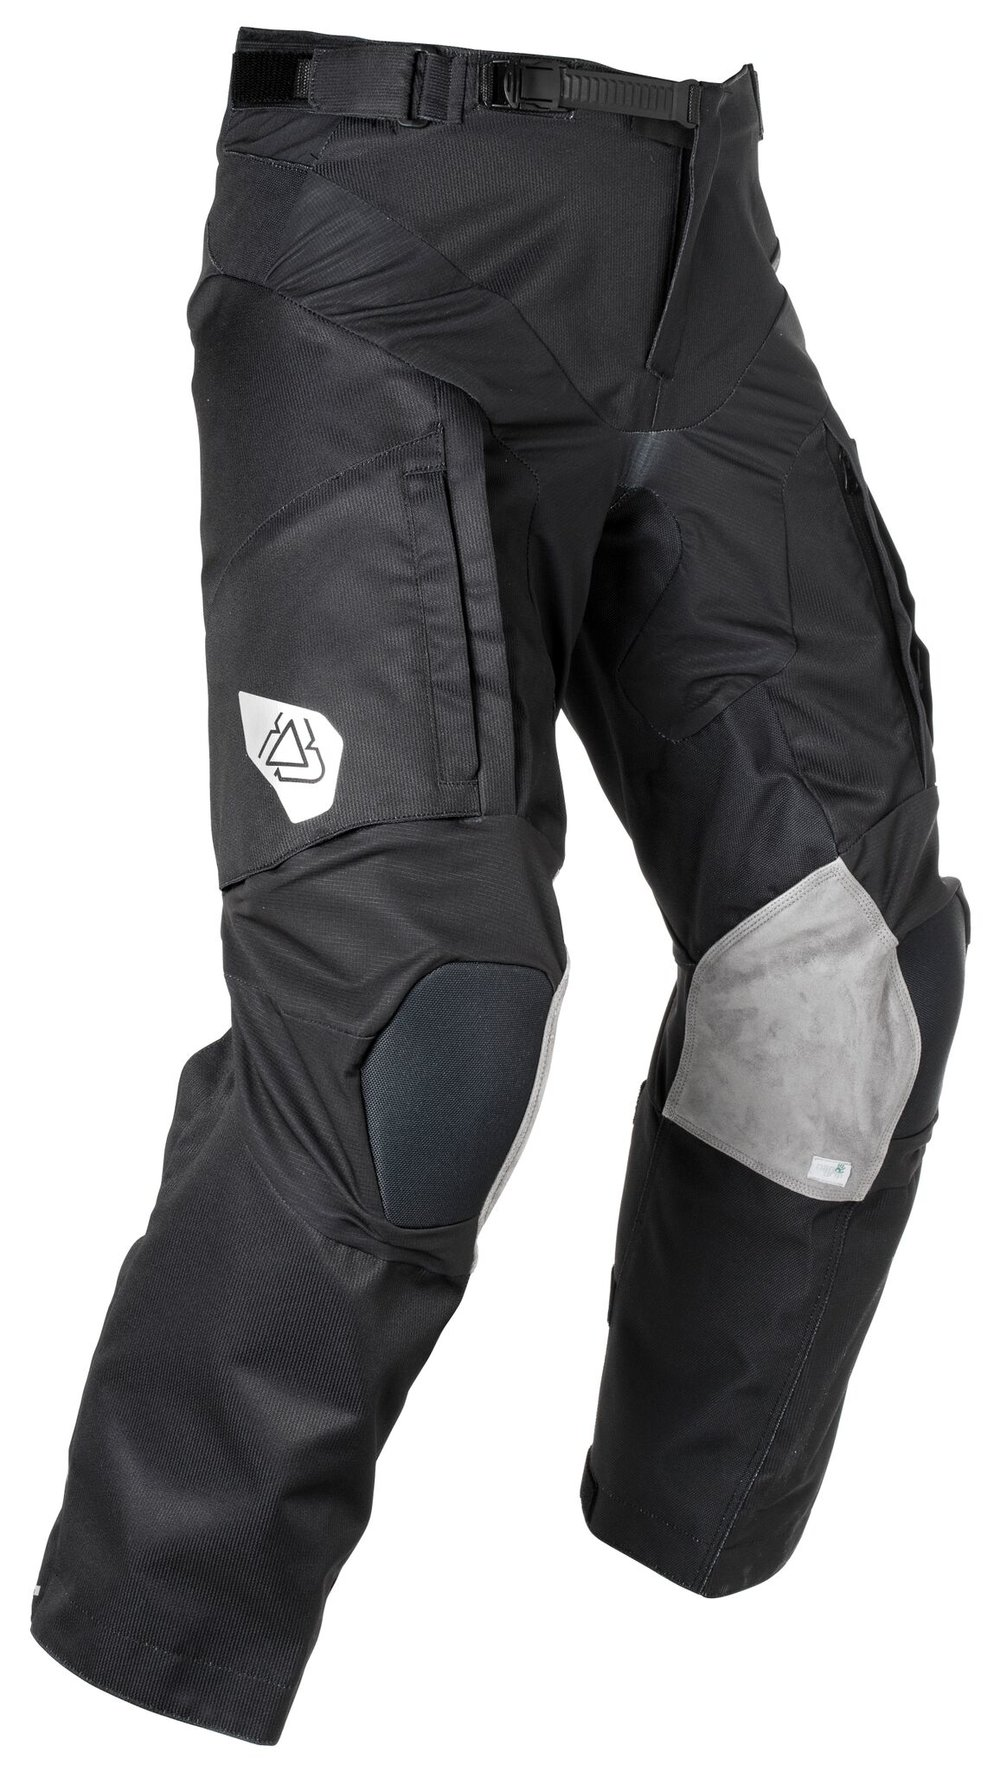 GPX 5.5 Enduro Black Grey Pants.JPG